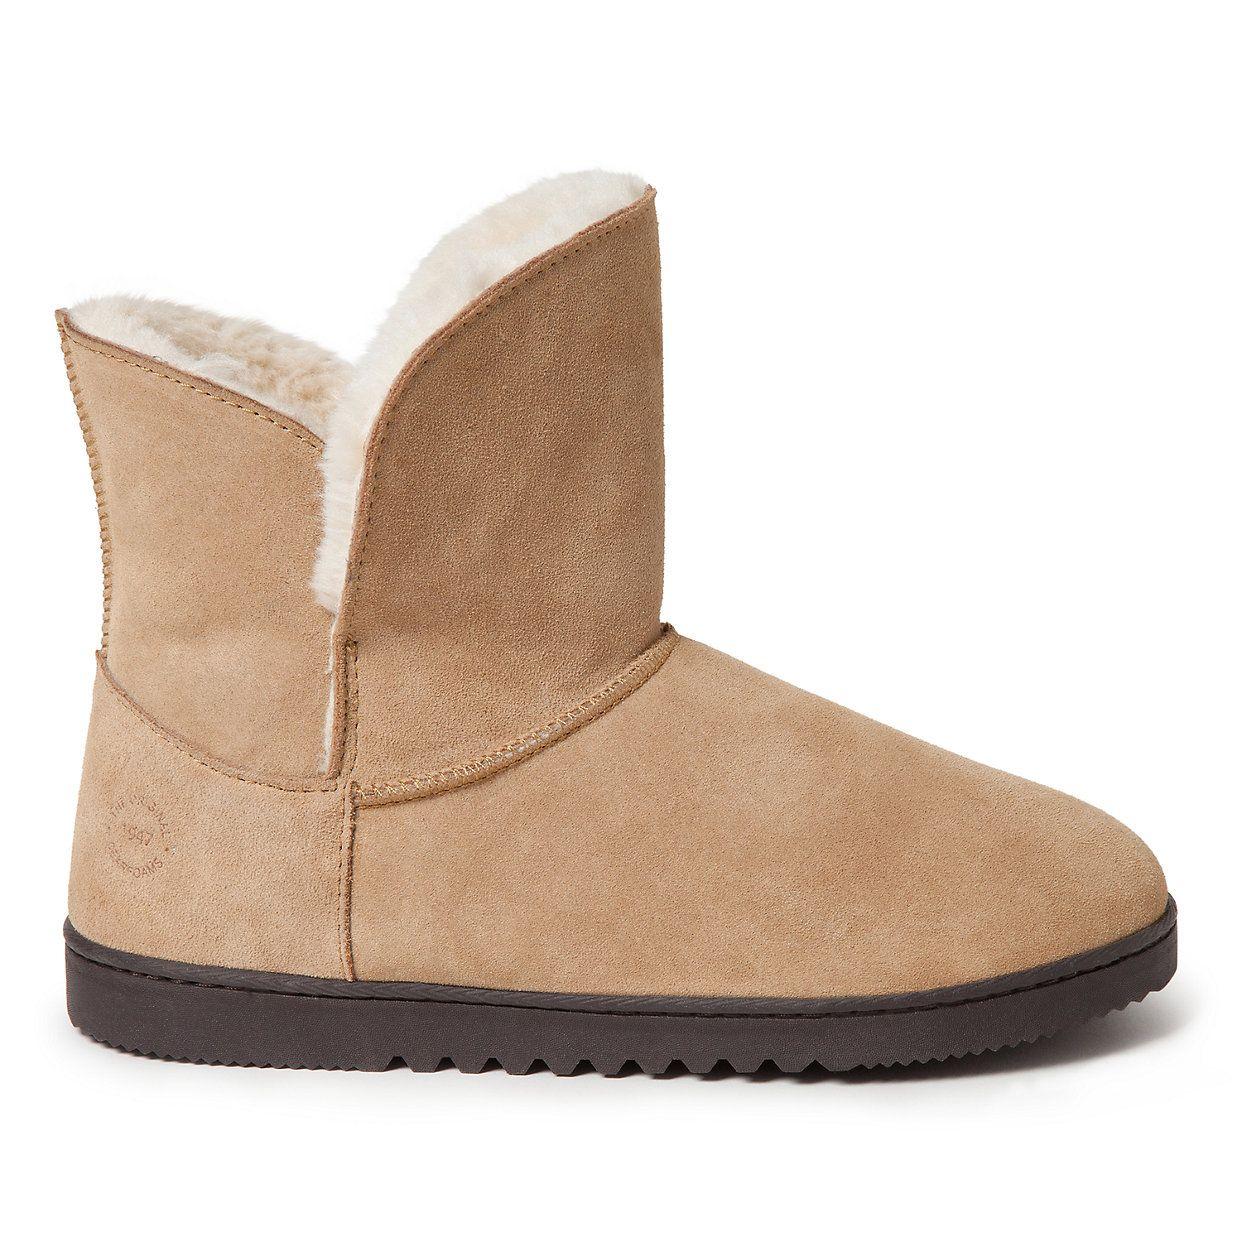 Pin on Winter boots women